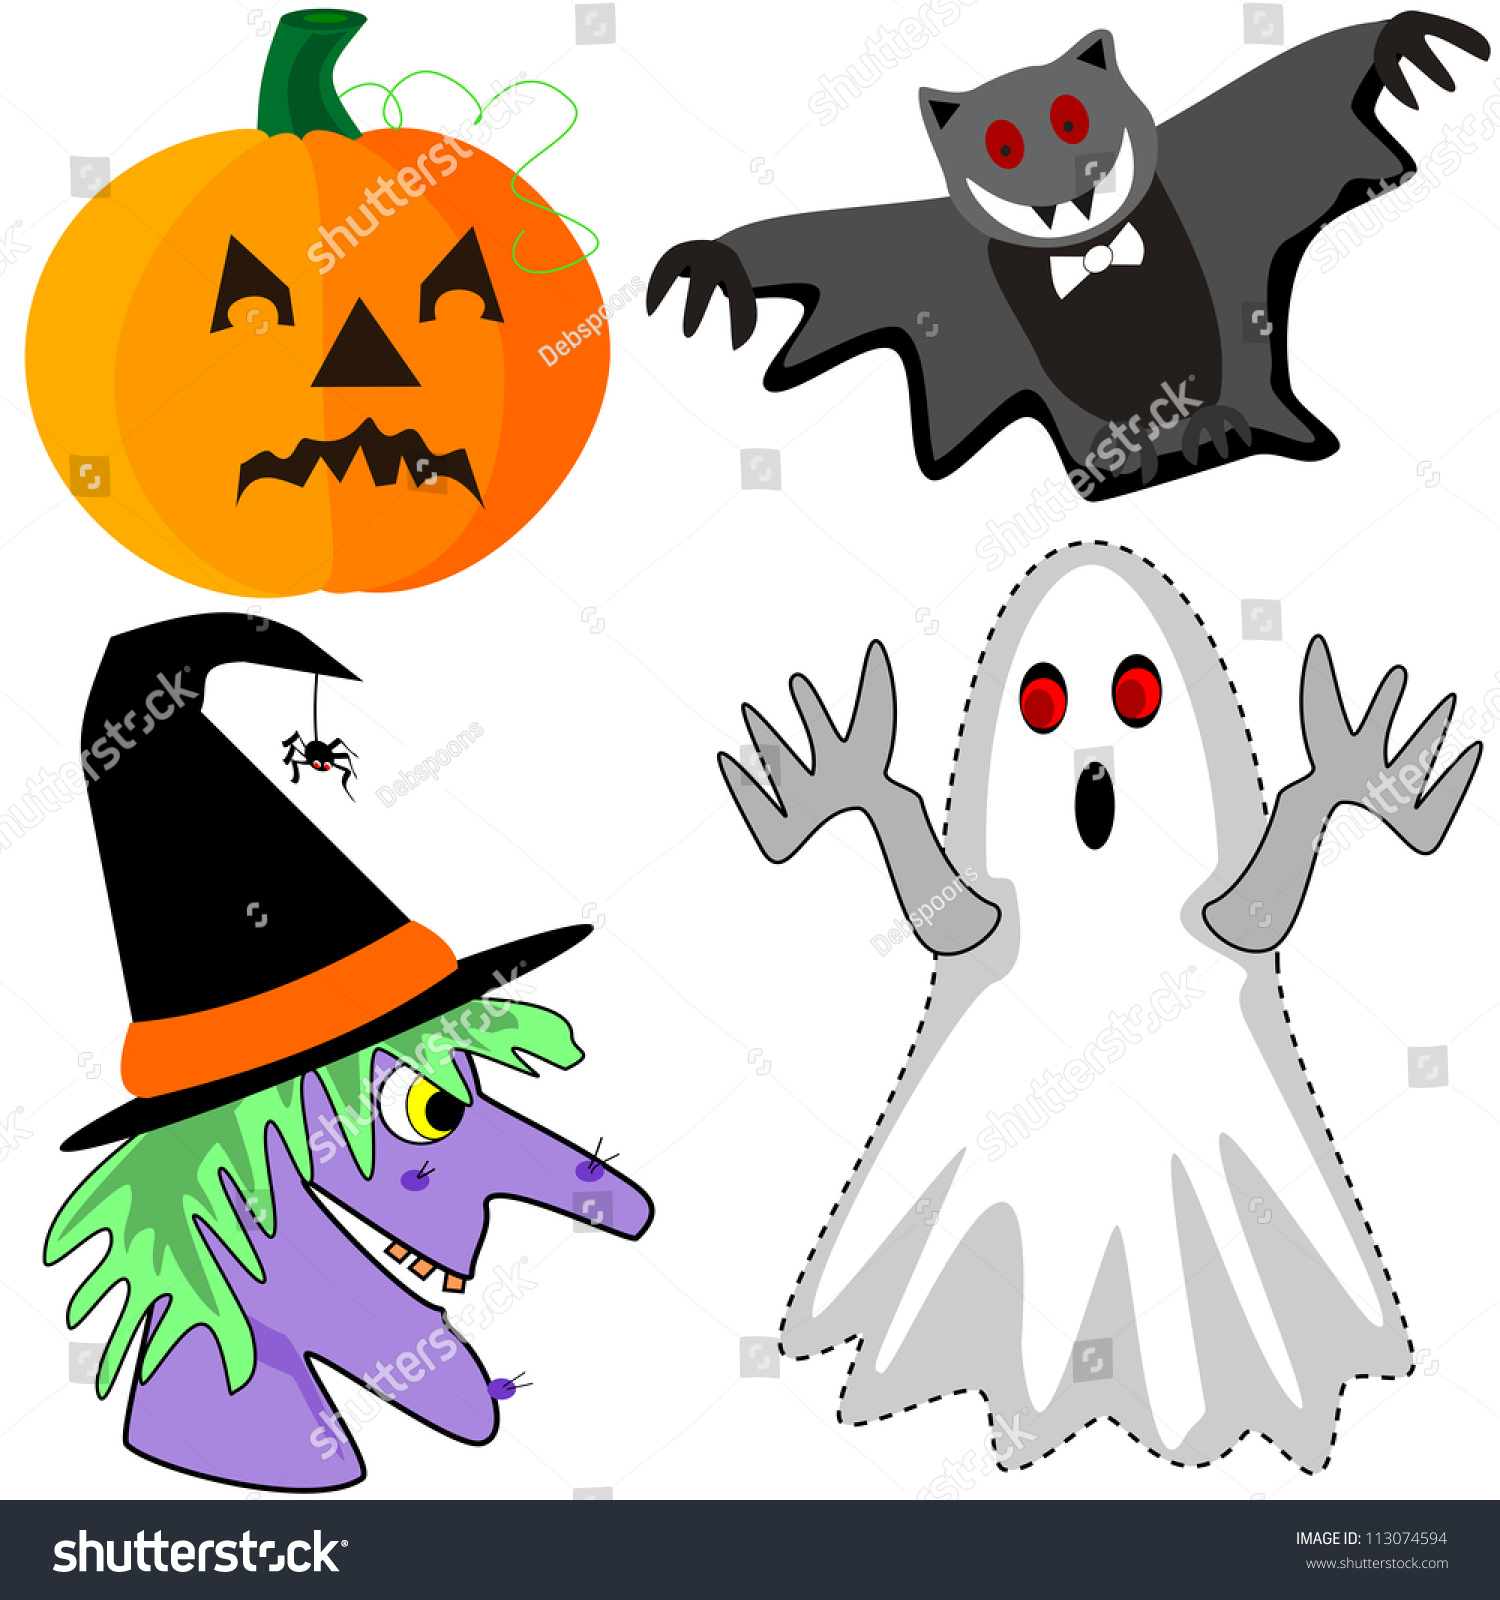 pumpkin bat witch ghost cartoon halloween stock illustration